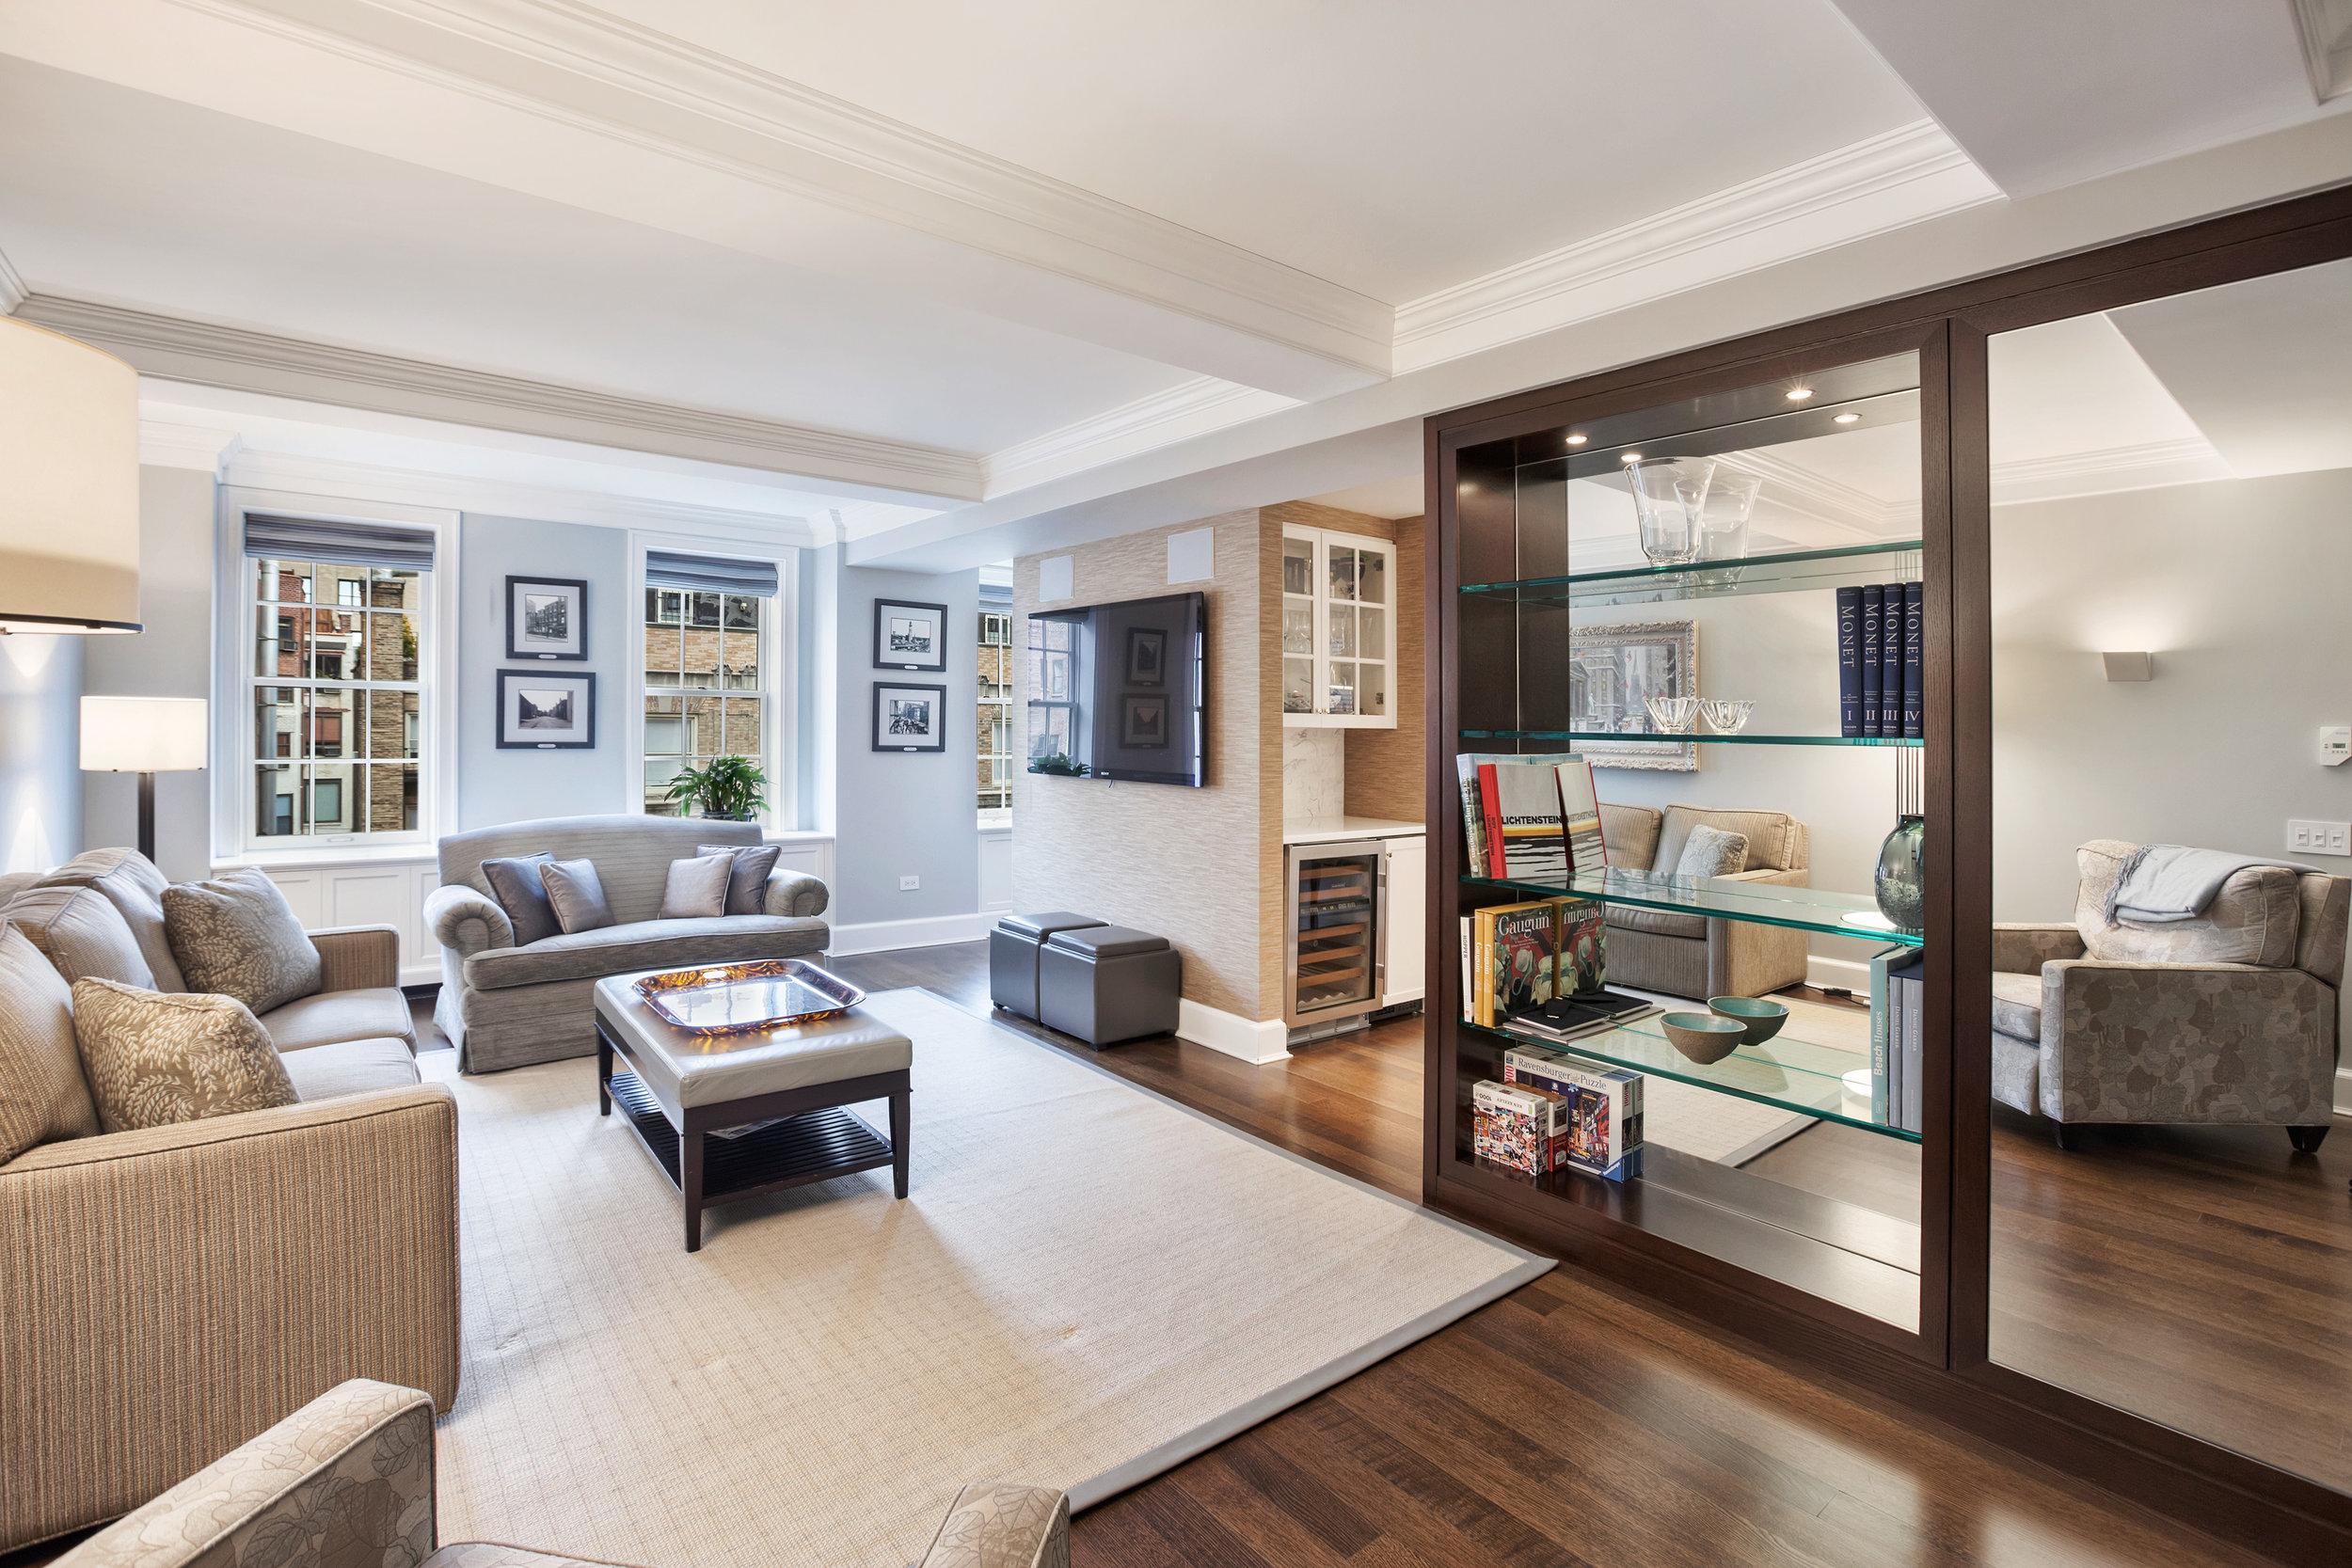 28 East 10th Street, Unit 10H - $6,300,000